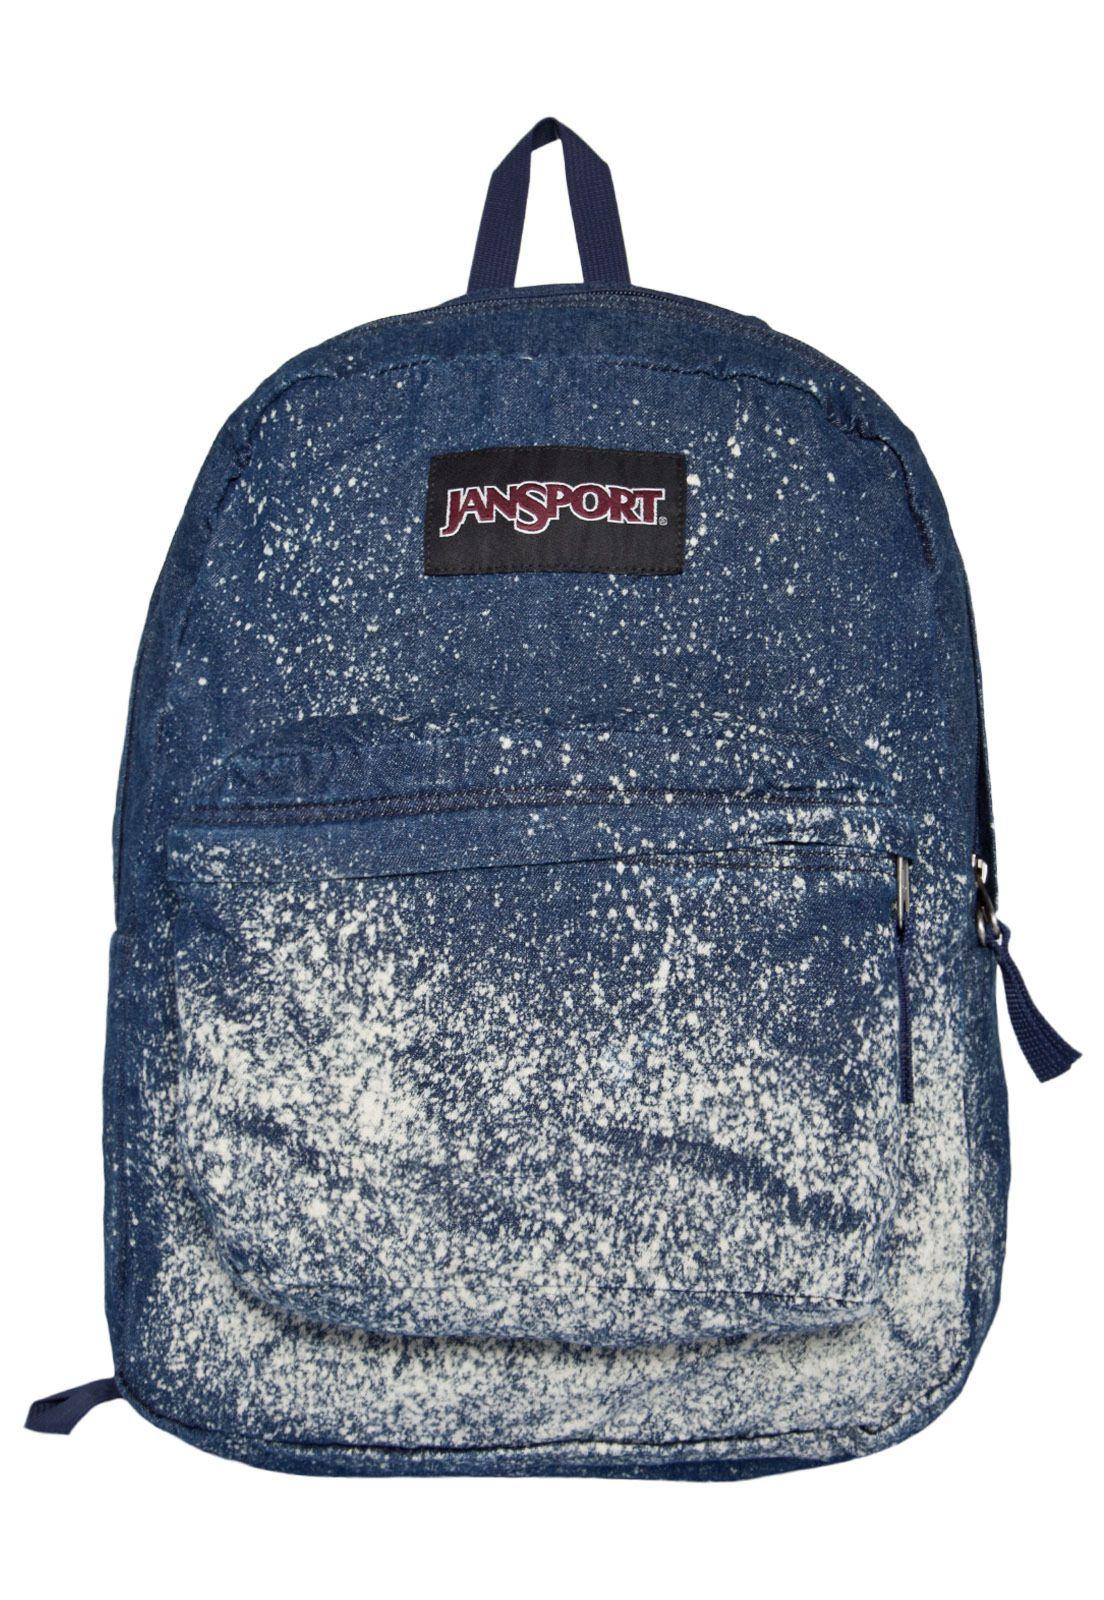 3daf9586dd1 Mochila Jeans Jansport Azul - Compre Agora